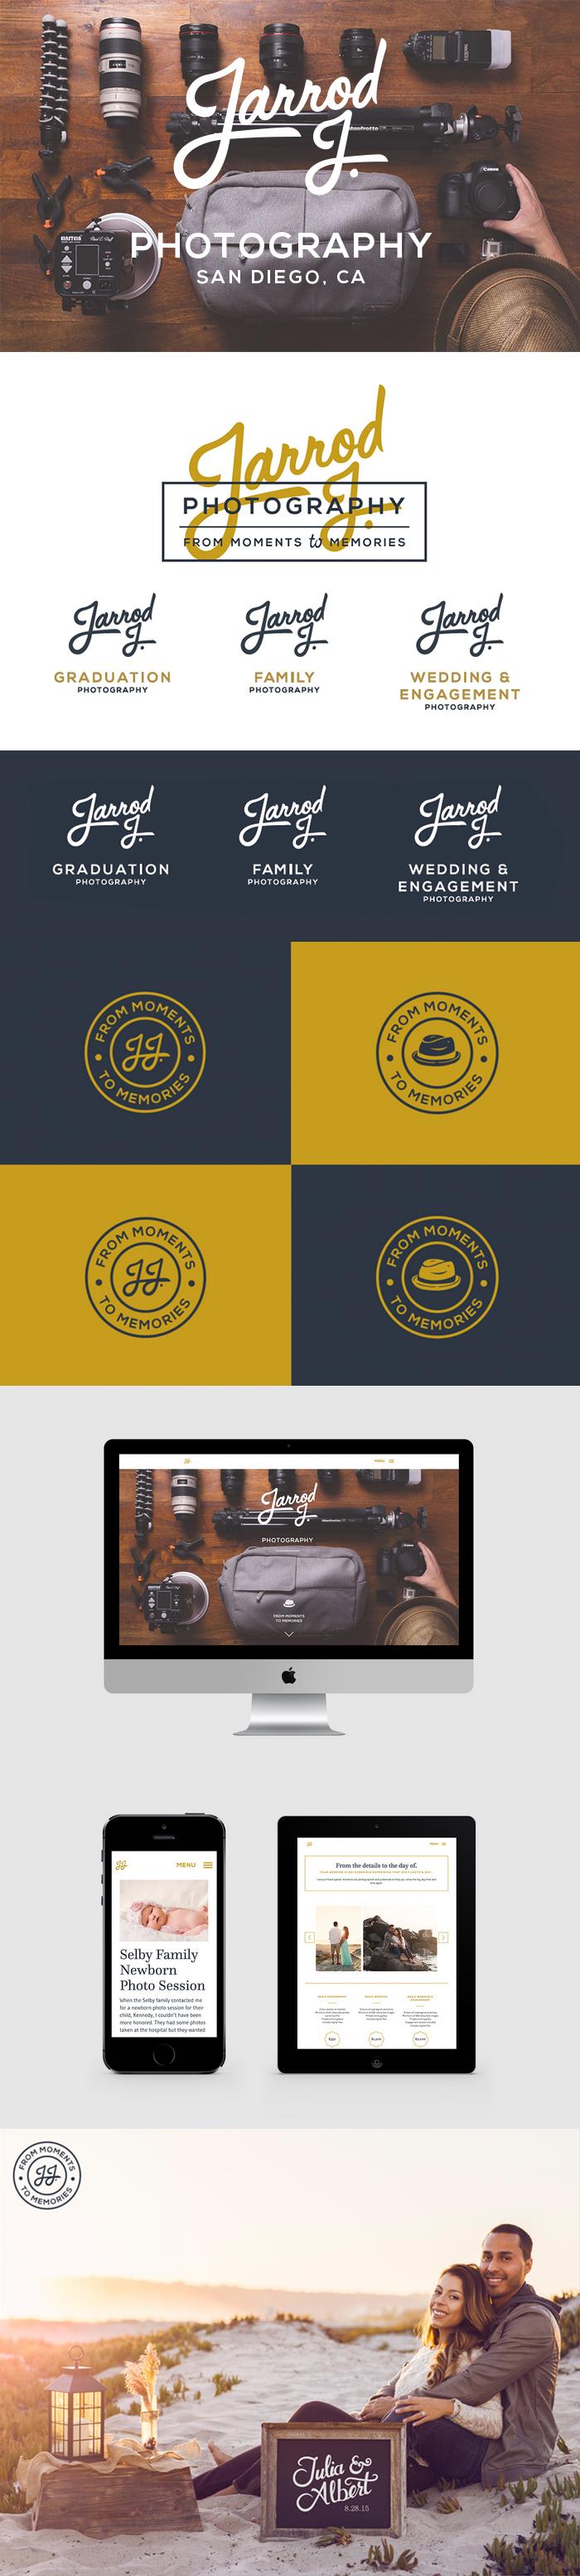 Brand work and responsive website development by MM Brand